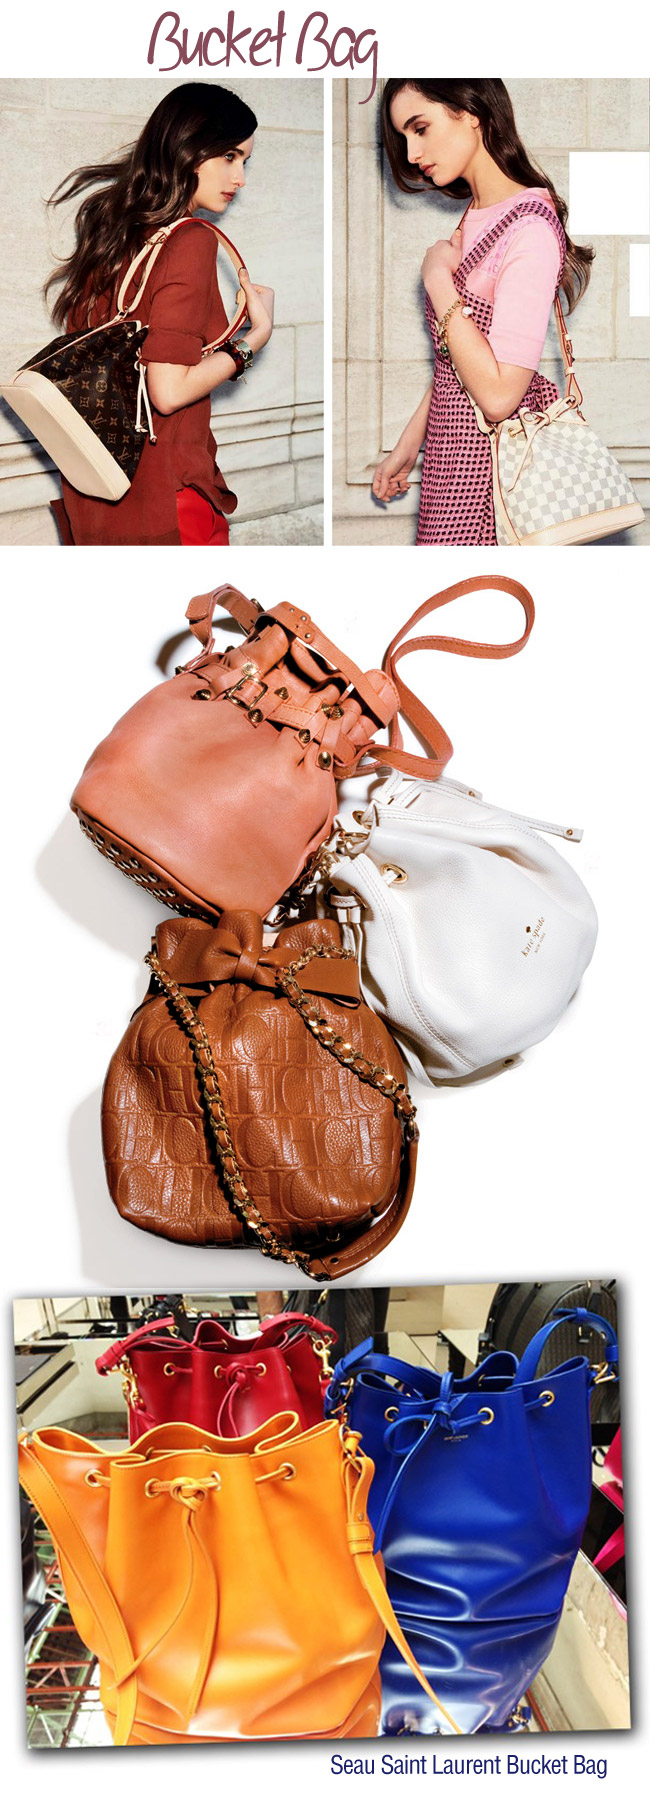 Bucket-Bag_01